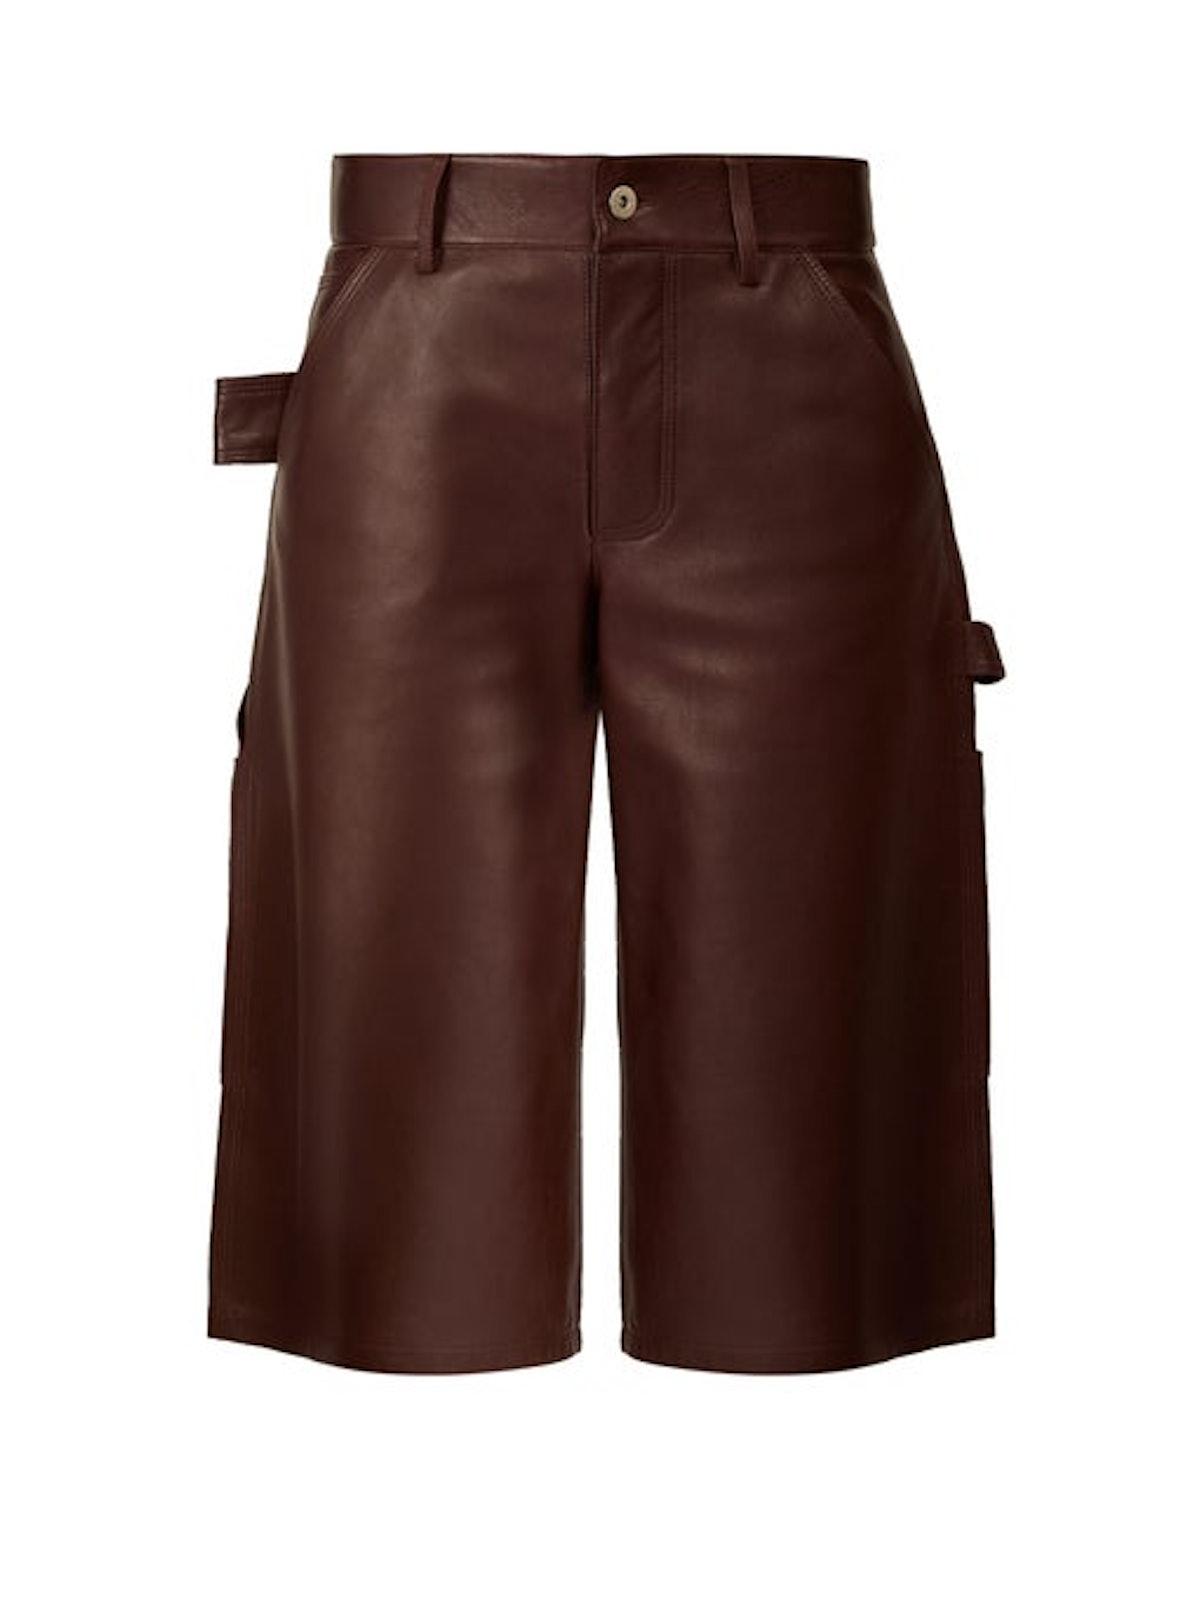 Knee-Length Leather Shorts